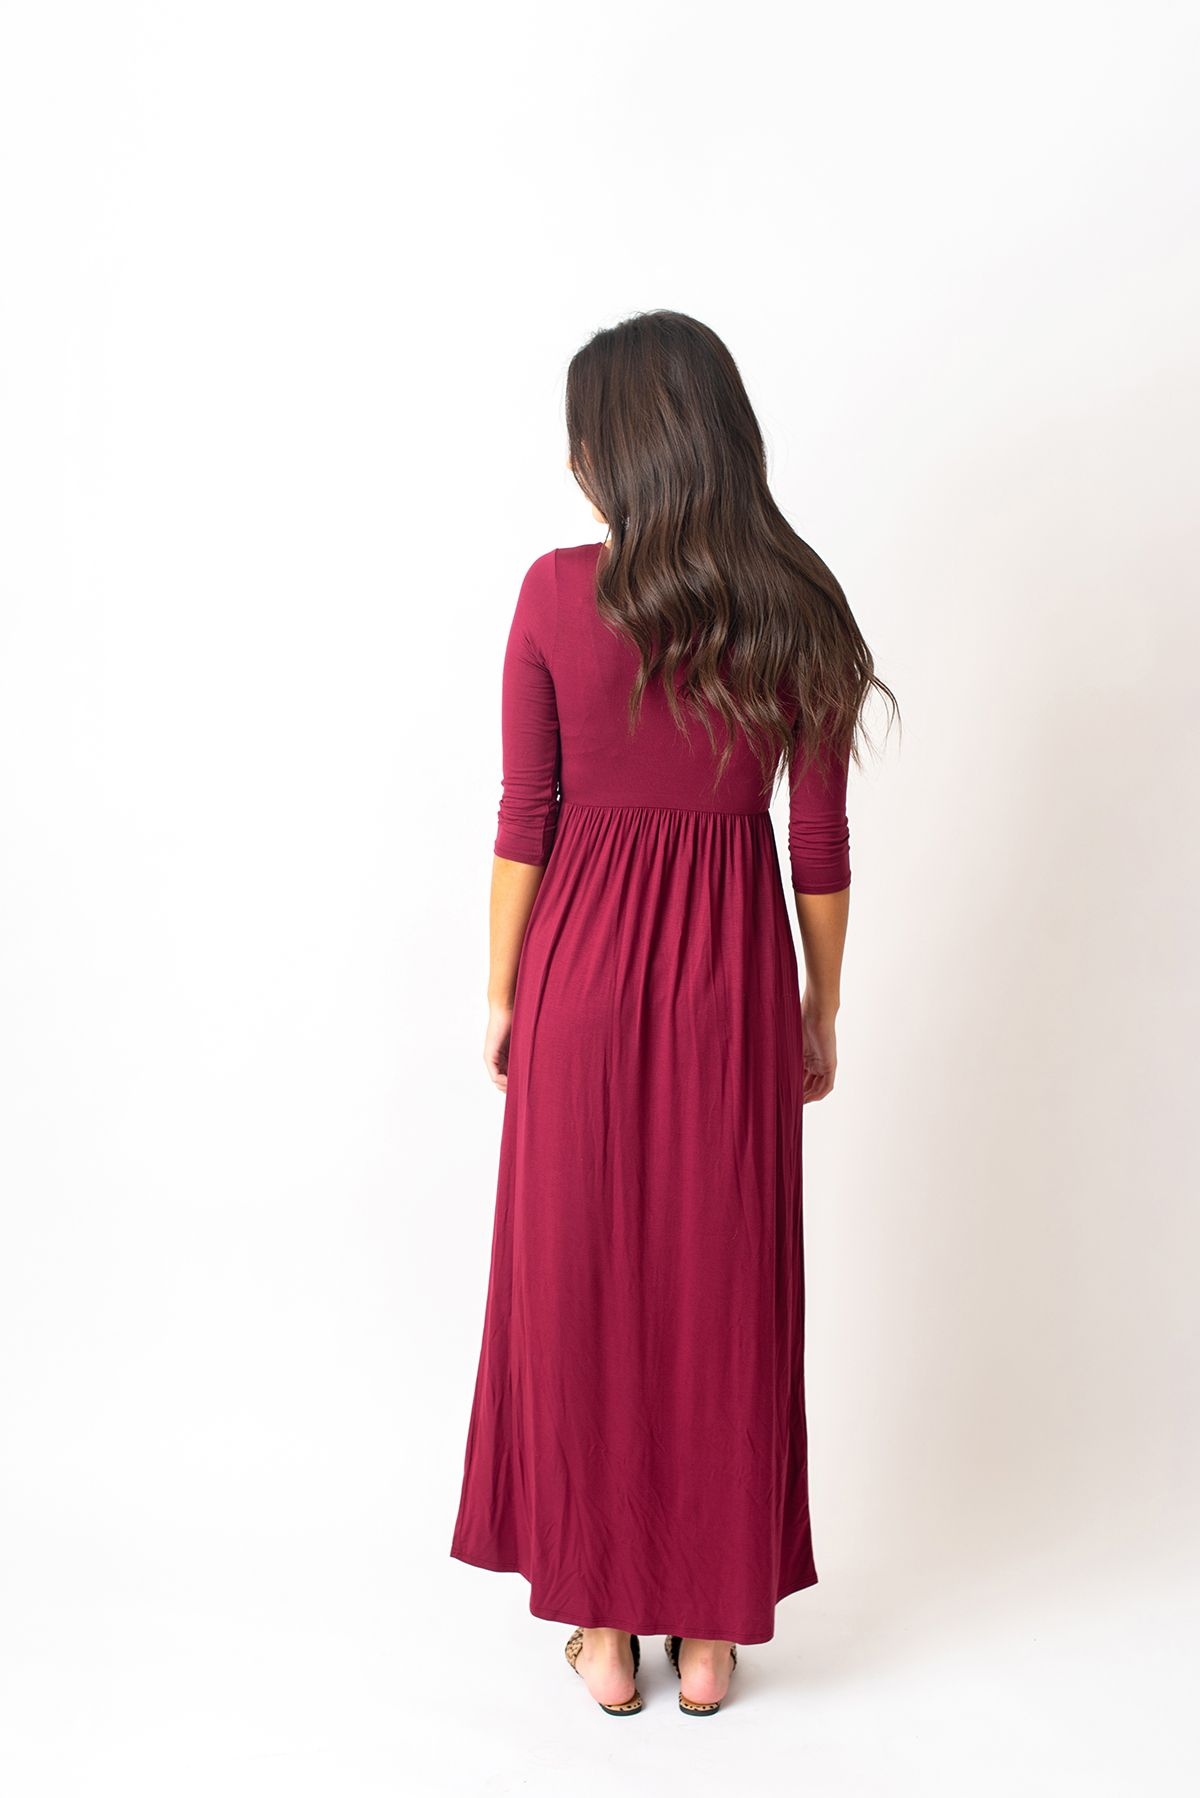 036 24 75 The Grace Burgundy 3 4 Sleeve Maxi Dress Https Batessistersboutique Com Product The Grace Burgundy 3 Maxi Dress With Sleeves Dresses Maxi Dress [ 1798 x 1200 Pixel ]